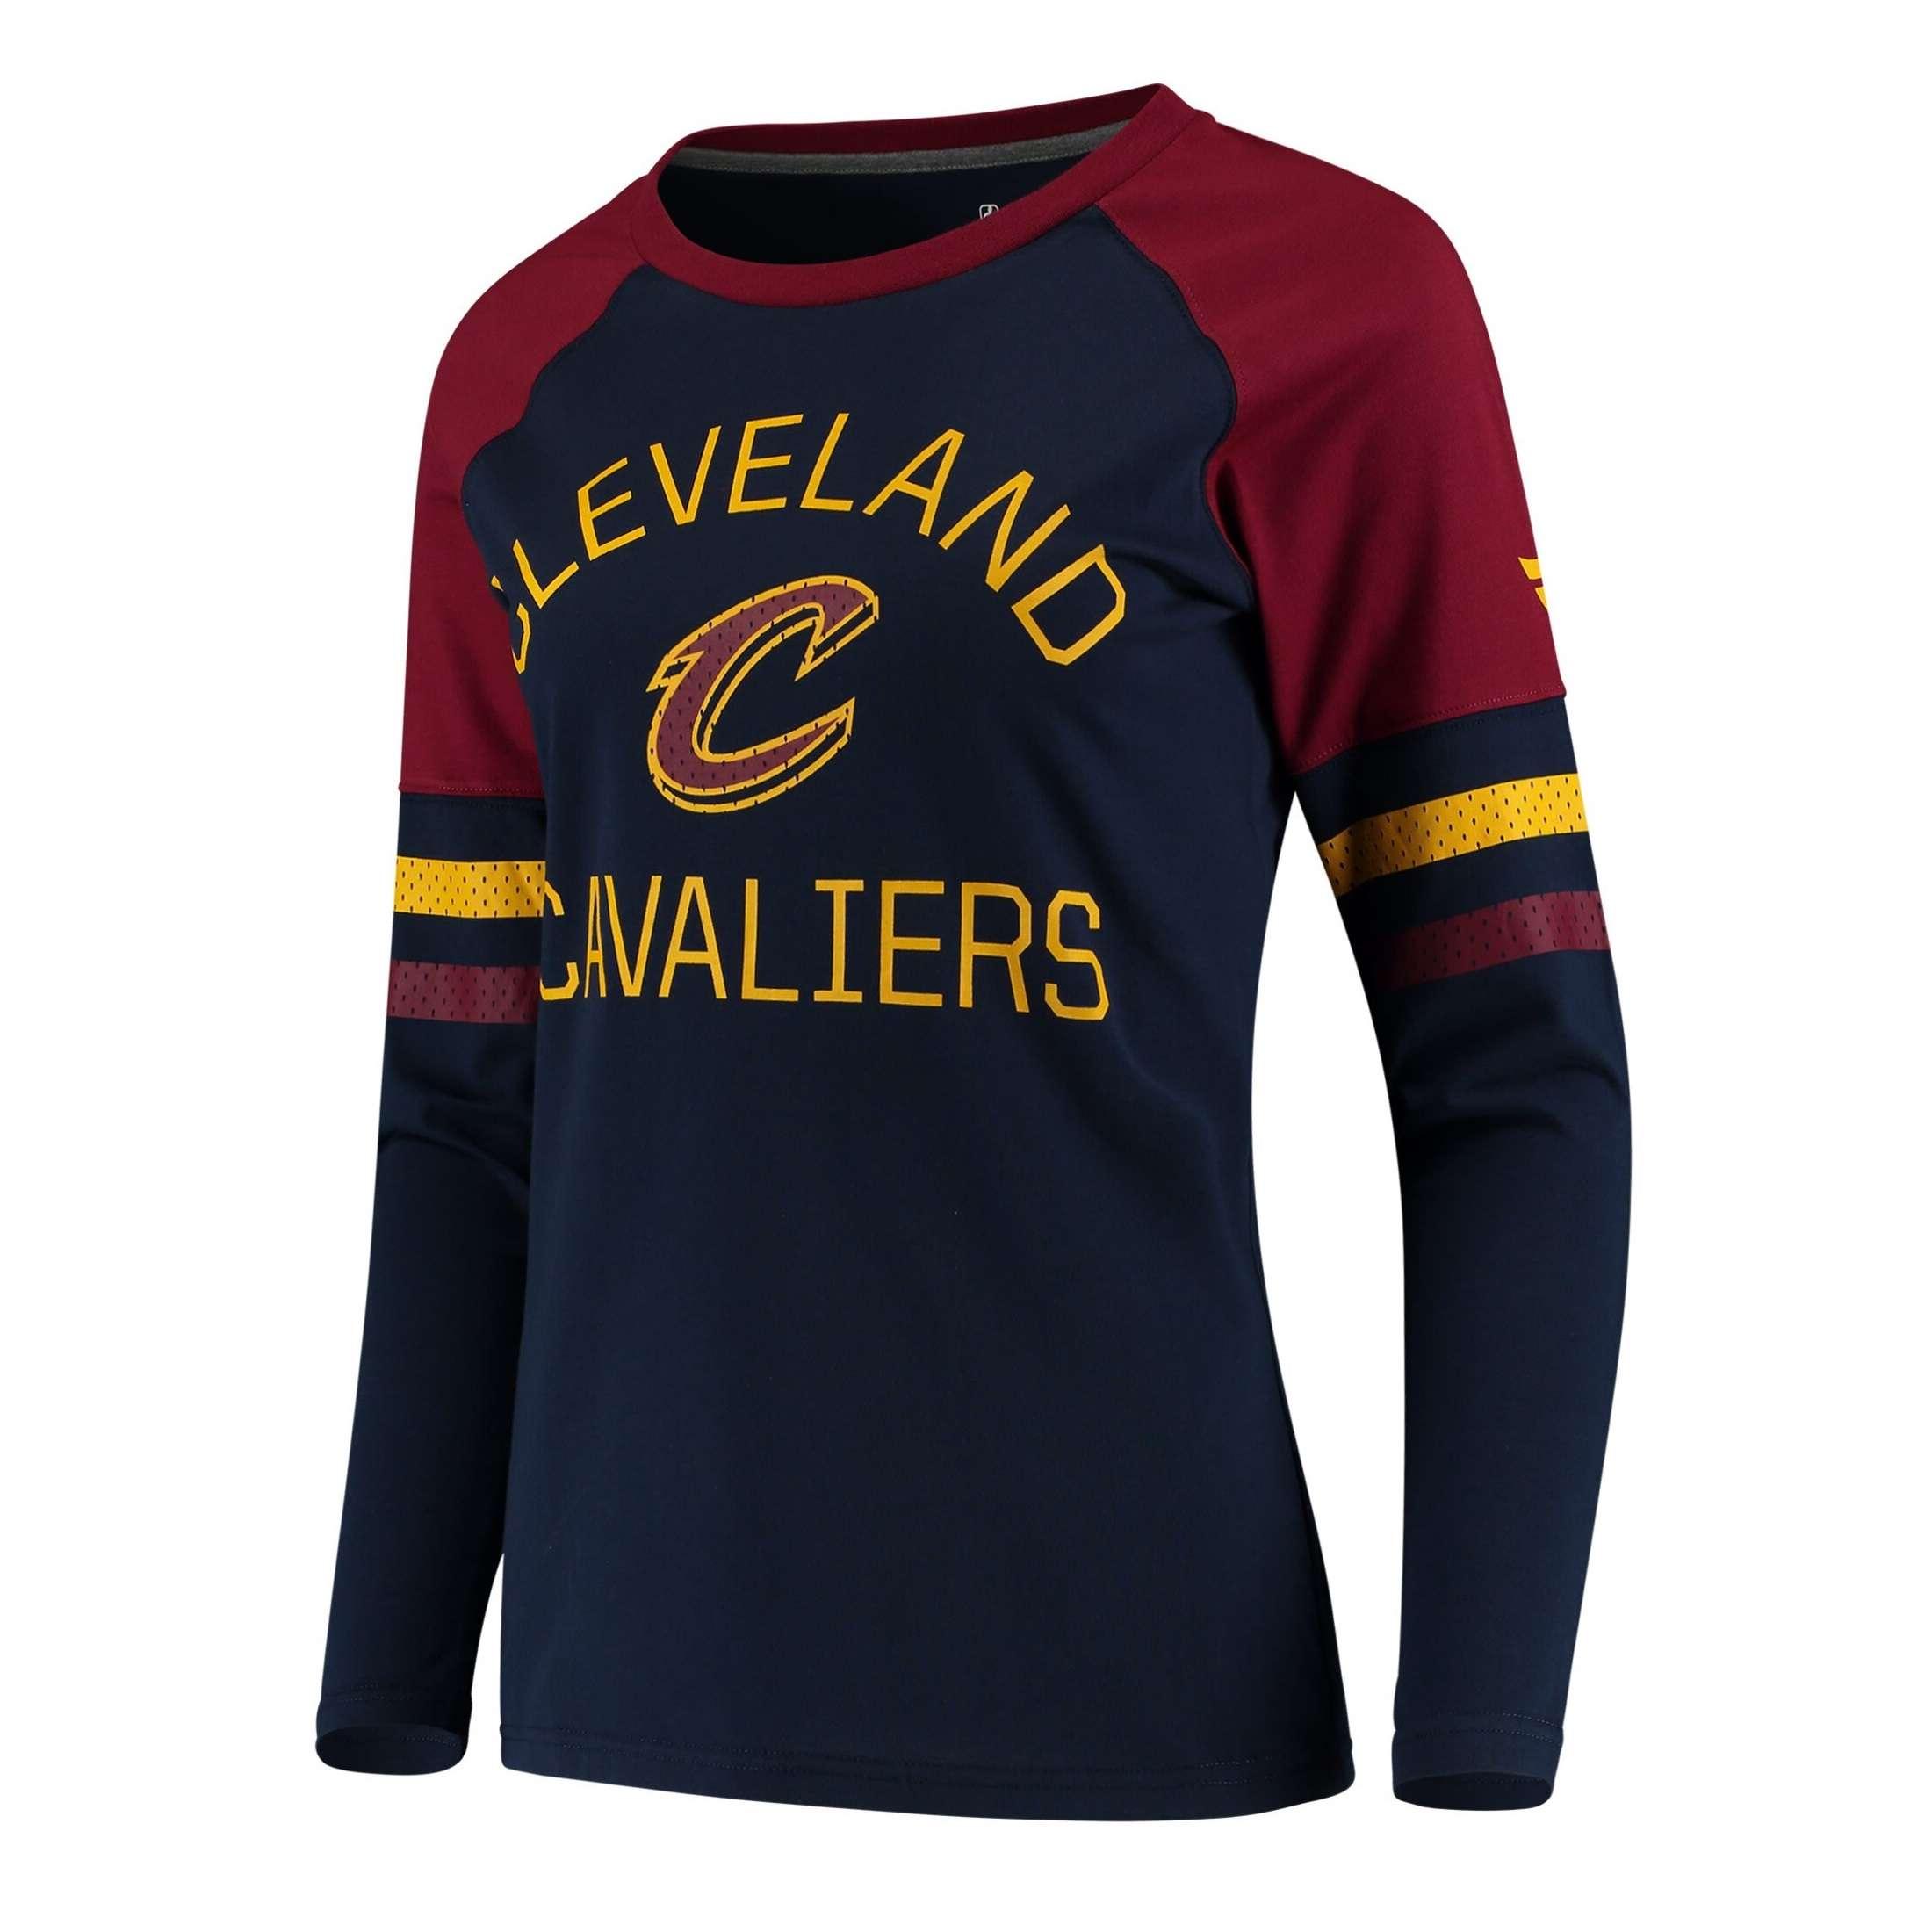 Shirt: NBA - Cleveland Cavaliers Navy/Wine Iconic T-Shirt (Women) Photo